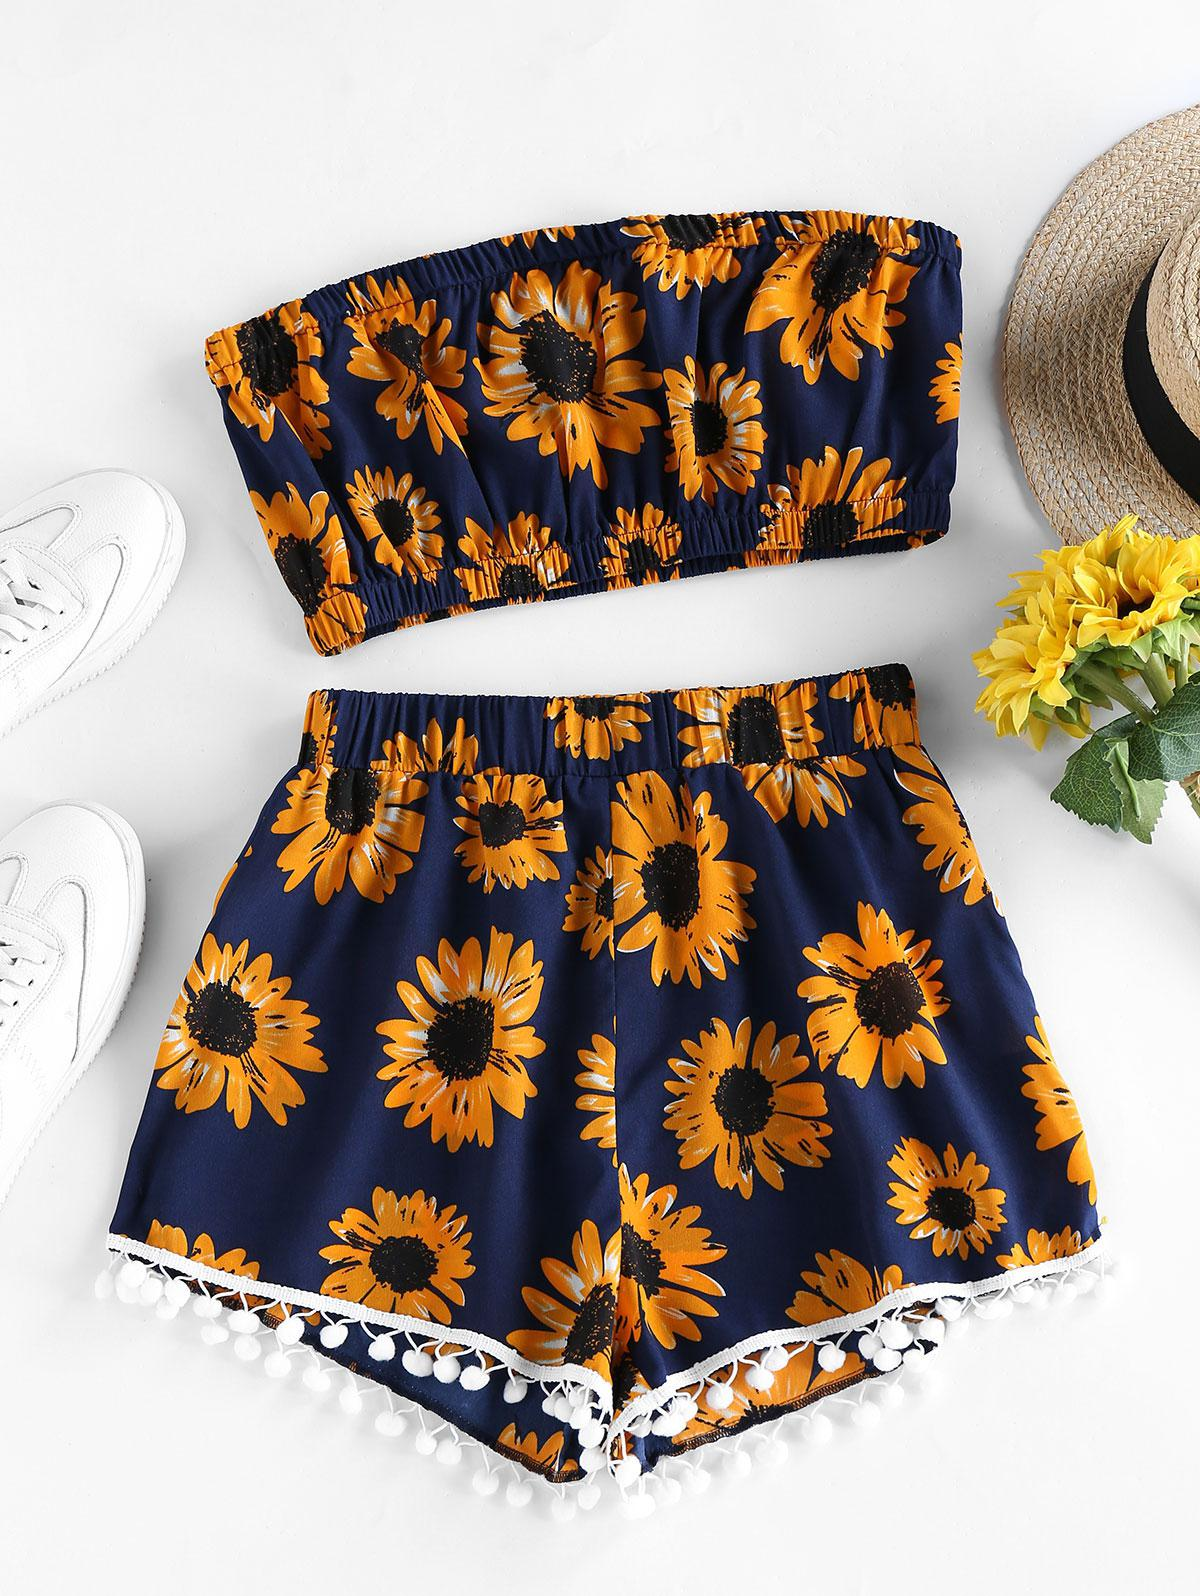 ZAFUL Sunflower Pompom Trim Bandeau Two Piece Set thumbnail